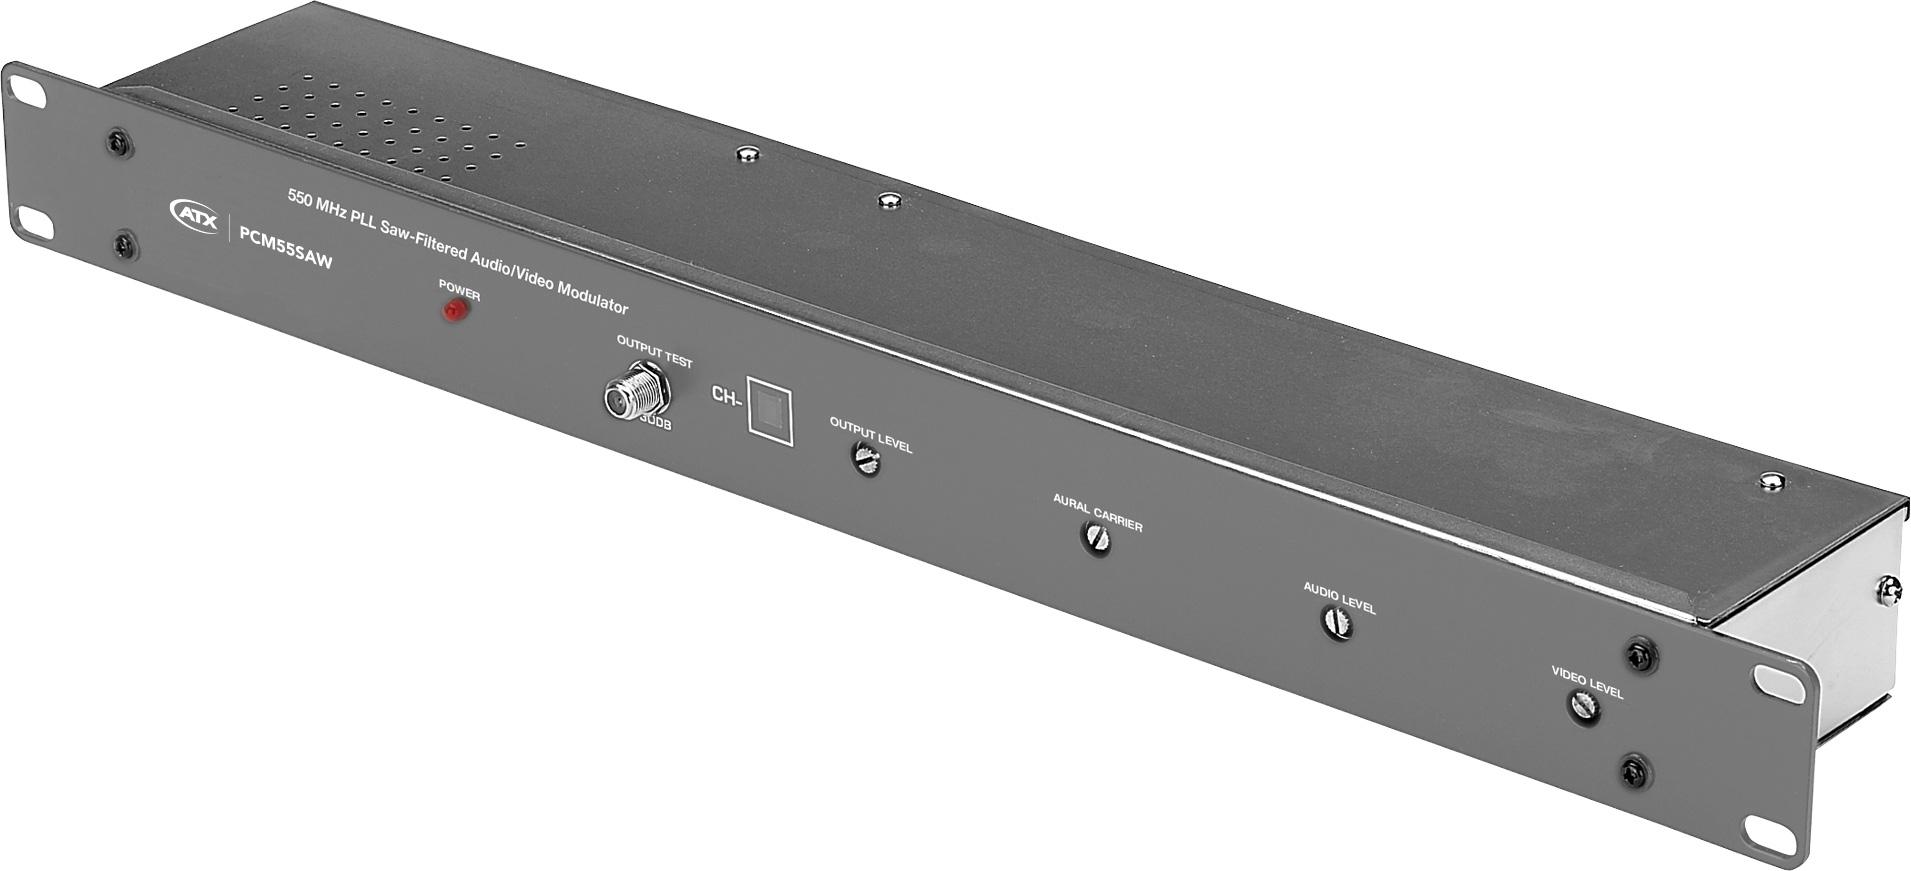 1 Channel Crystal A/V Modulator - Channel G PM-PCM55SAW-G